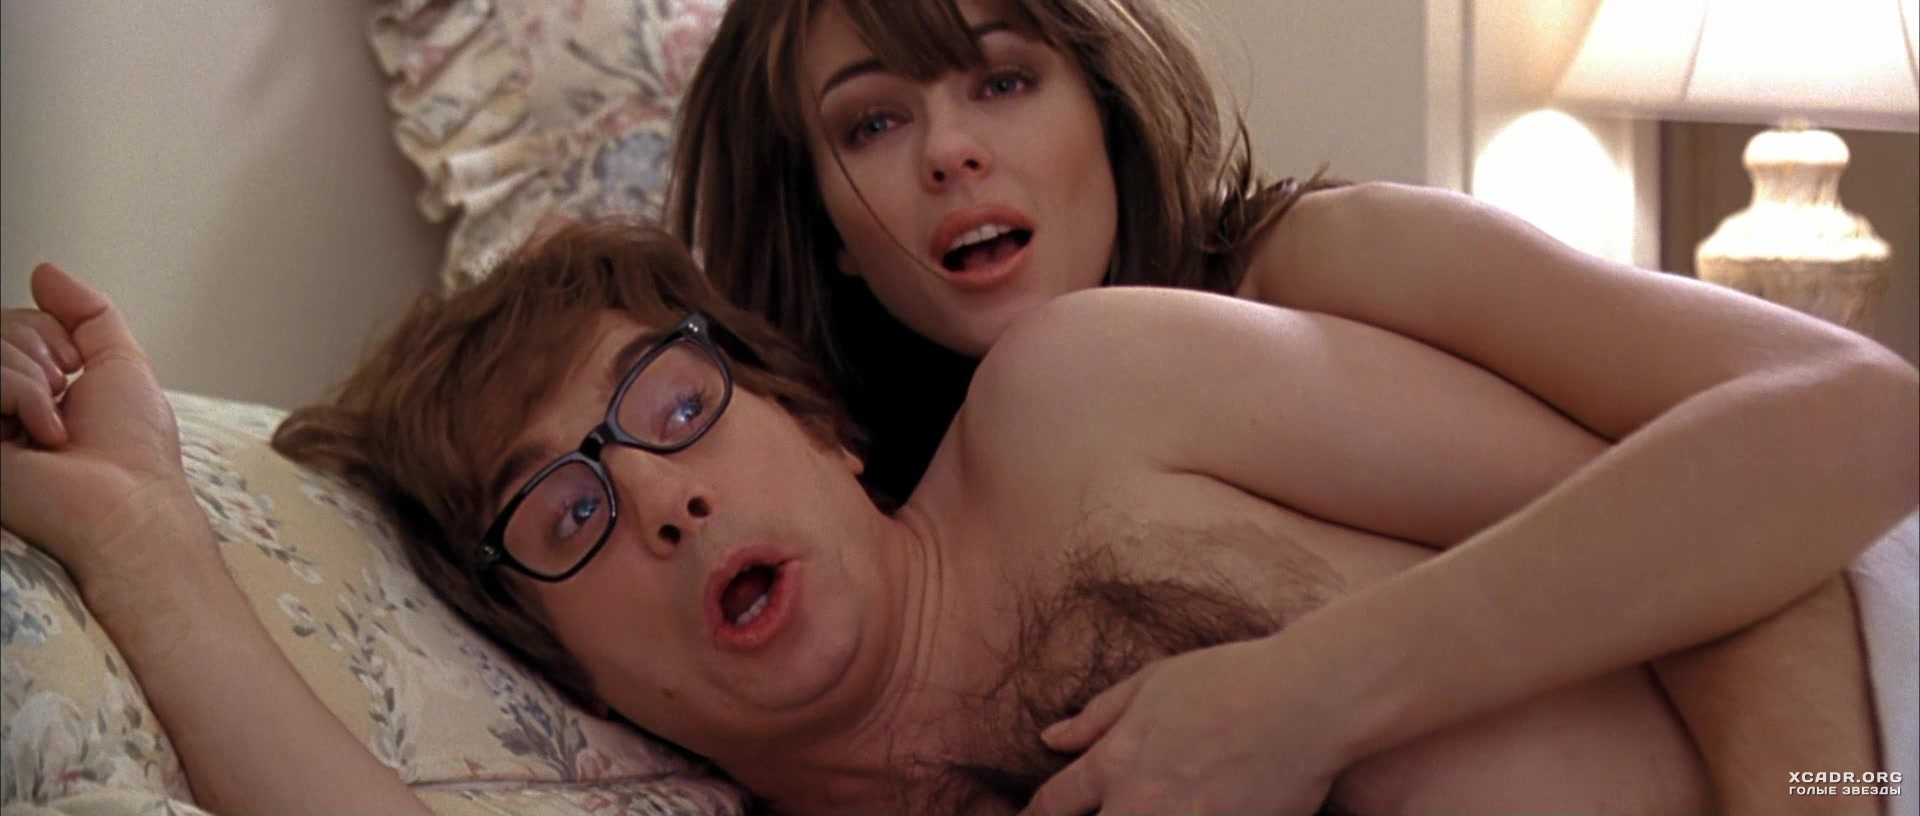 Austin powers elizabeth hurley nude